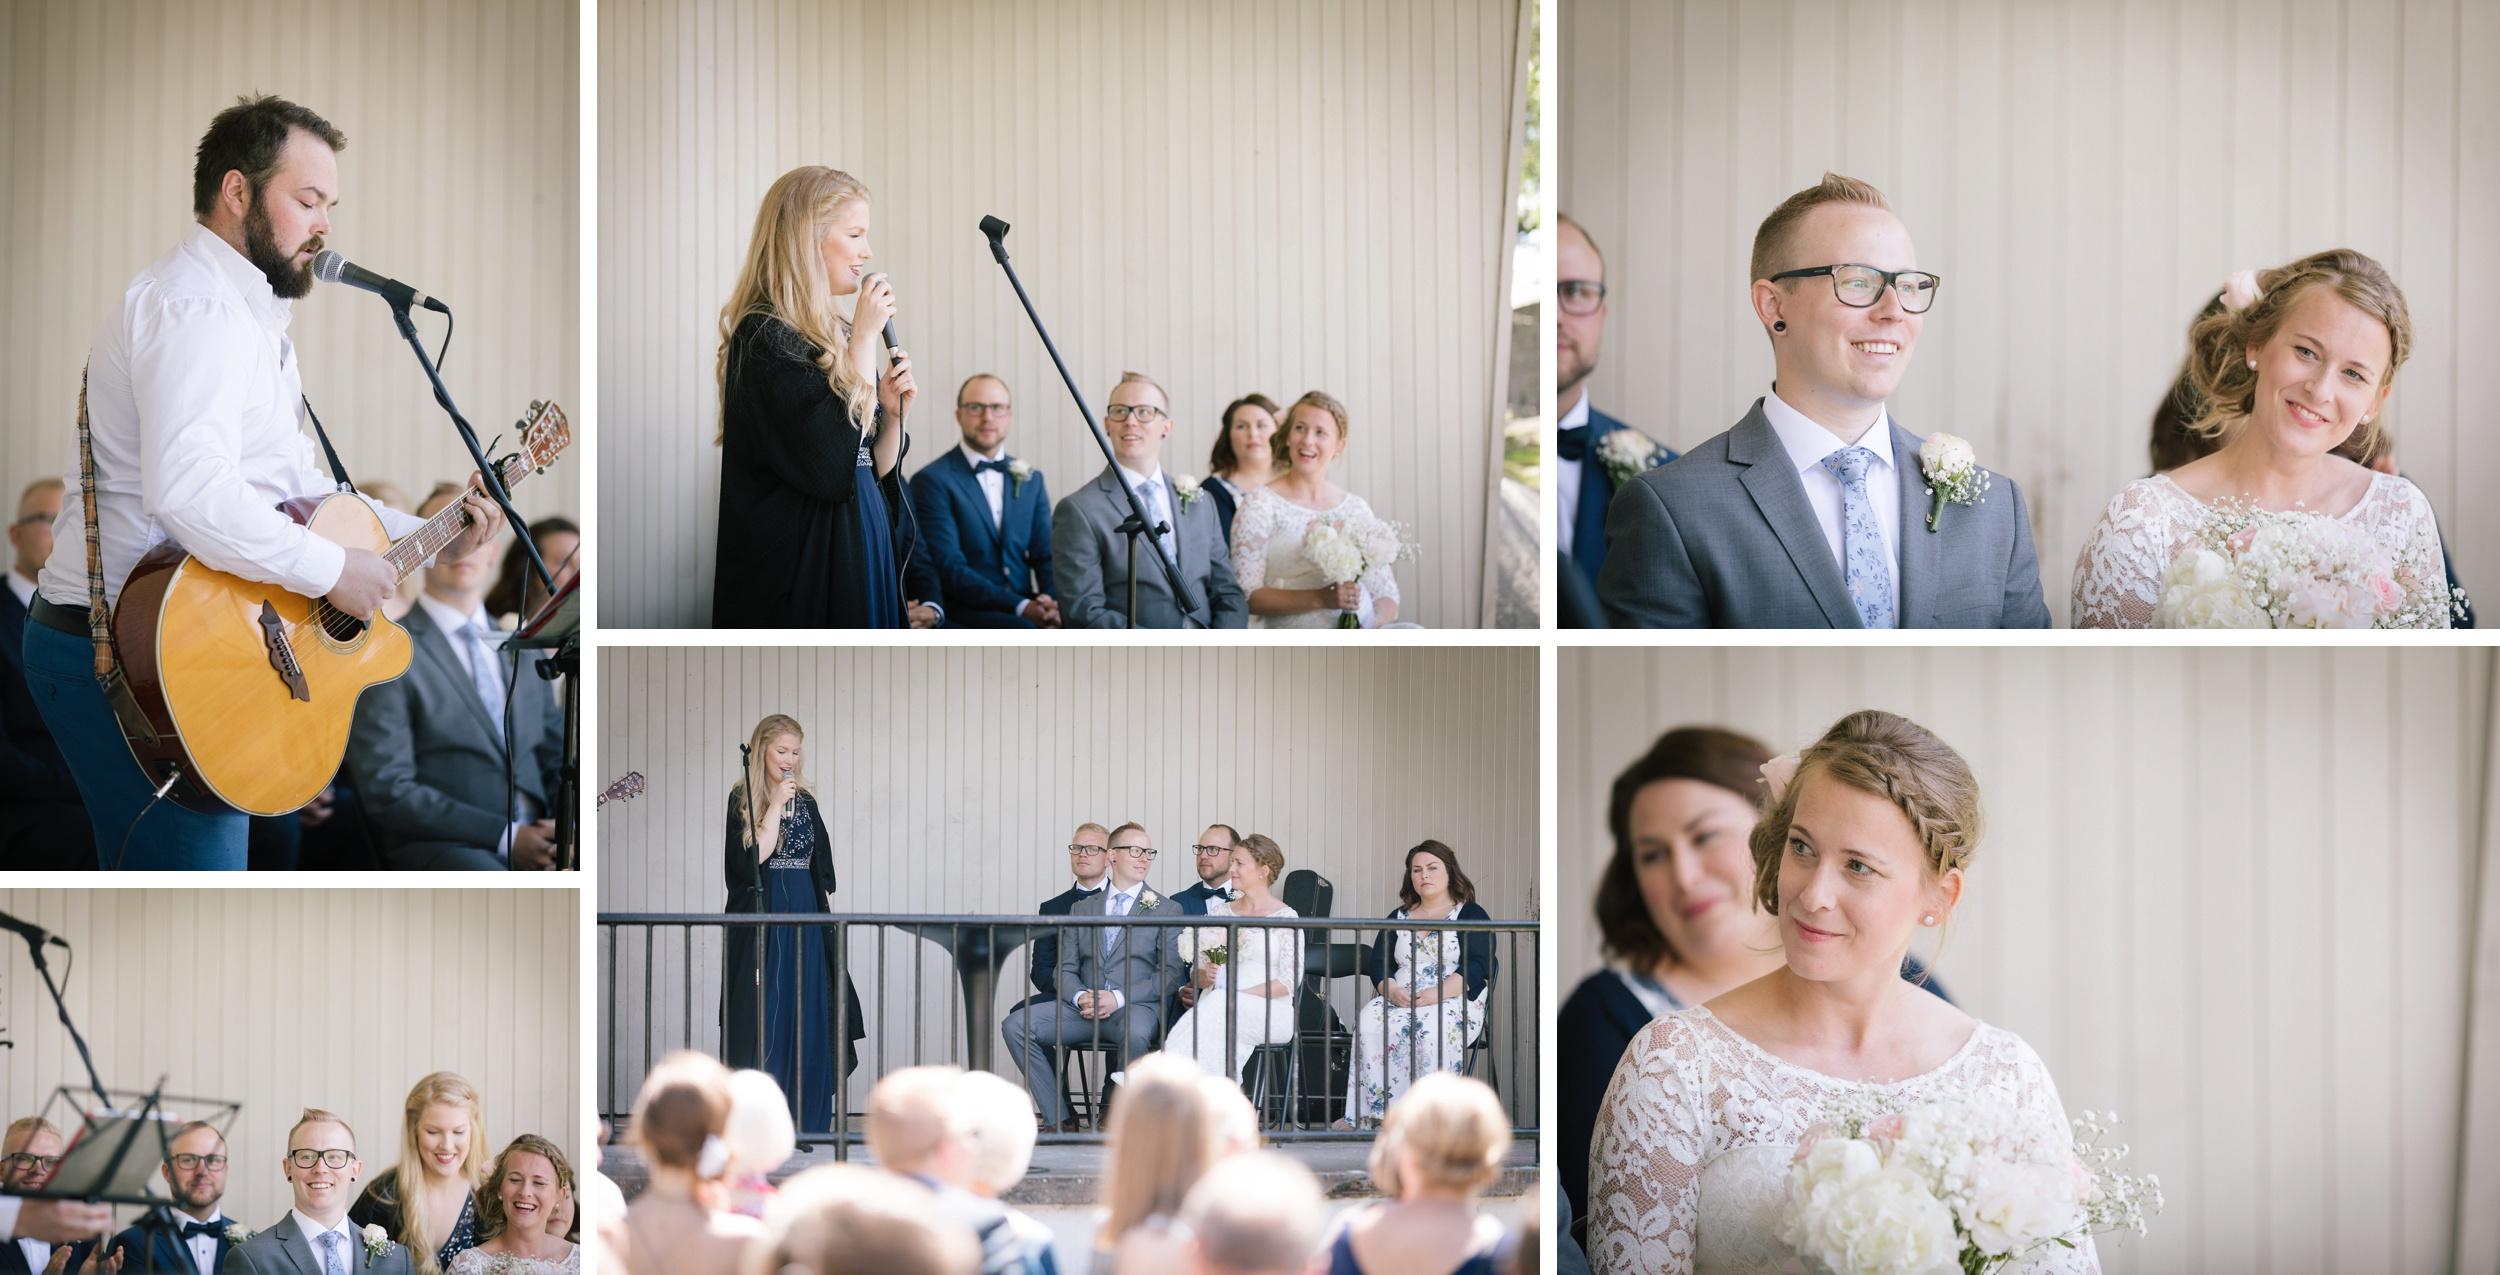 bryllup-bryllupsfotografering-bryllupsfotograf-sarpsborg-20170617-_H2A1918anneli_phillip_WEB.jpg